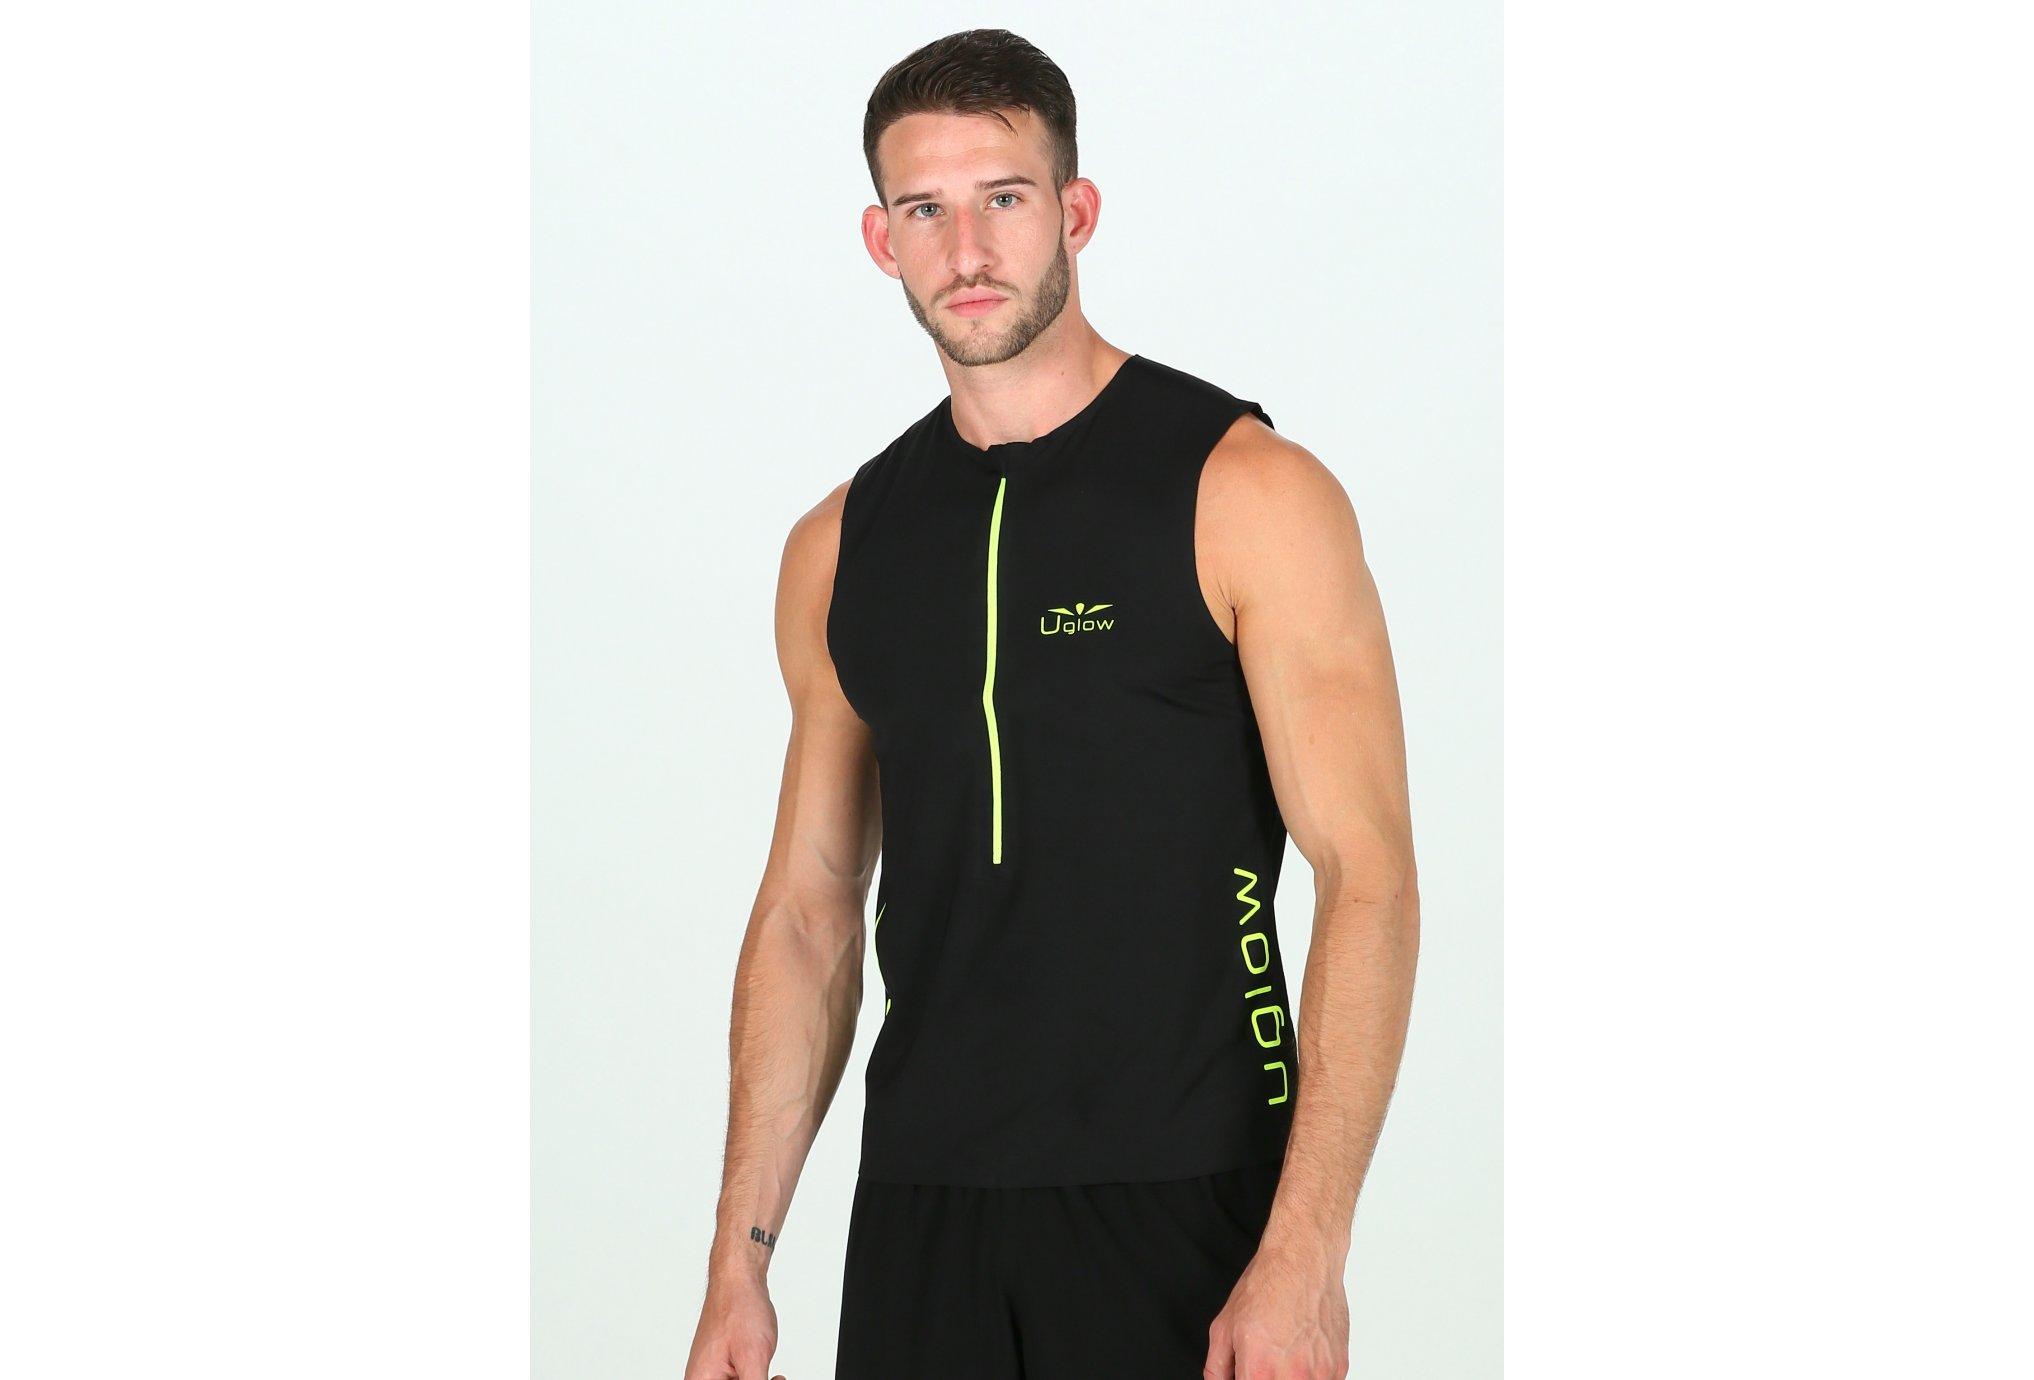 Uglow Race 1/2 zip M vêtement running homme